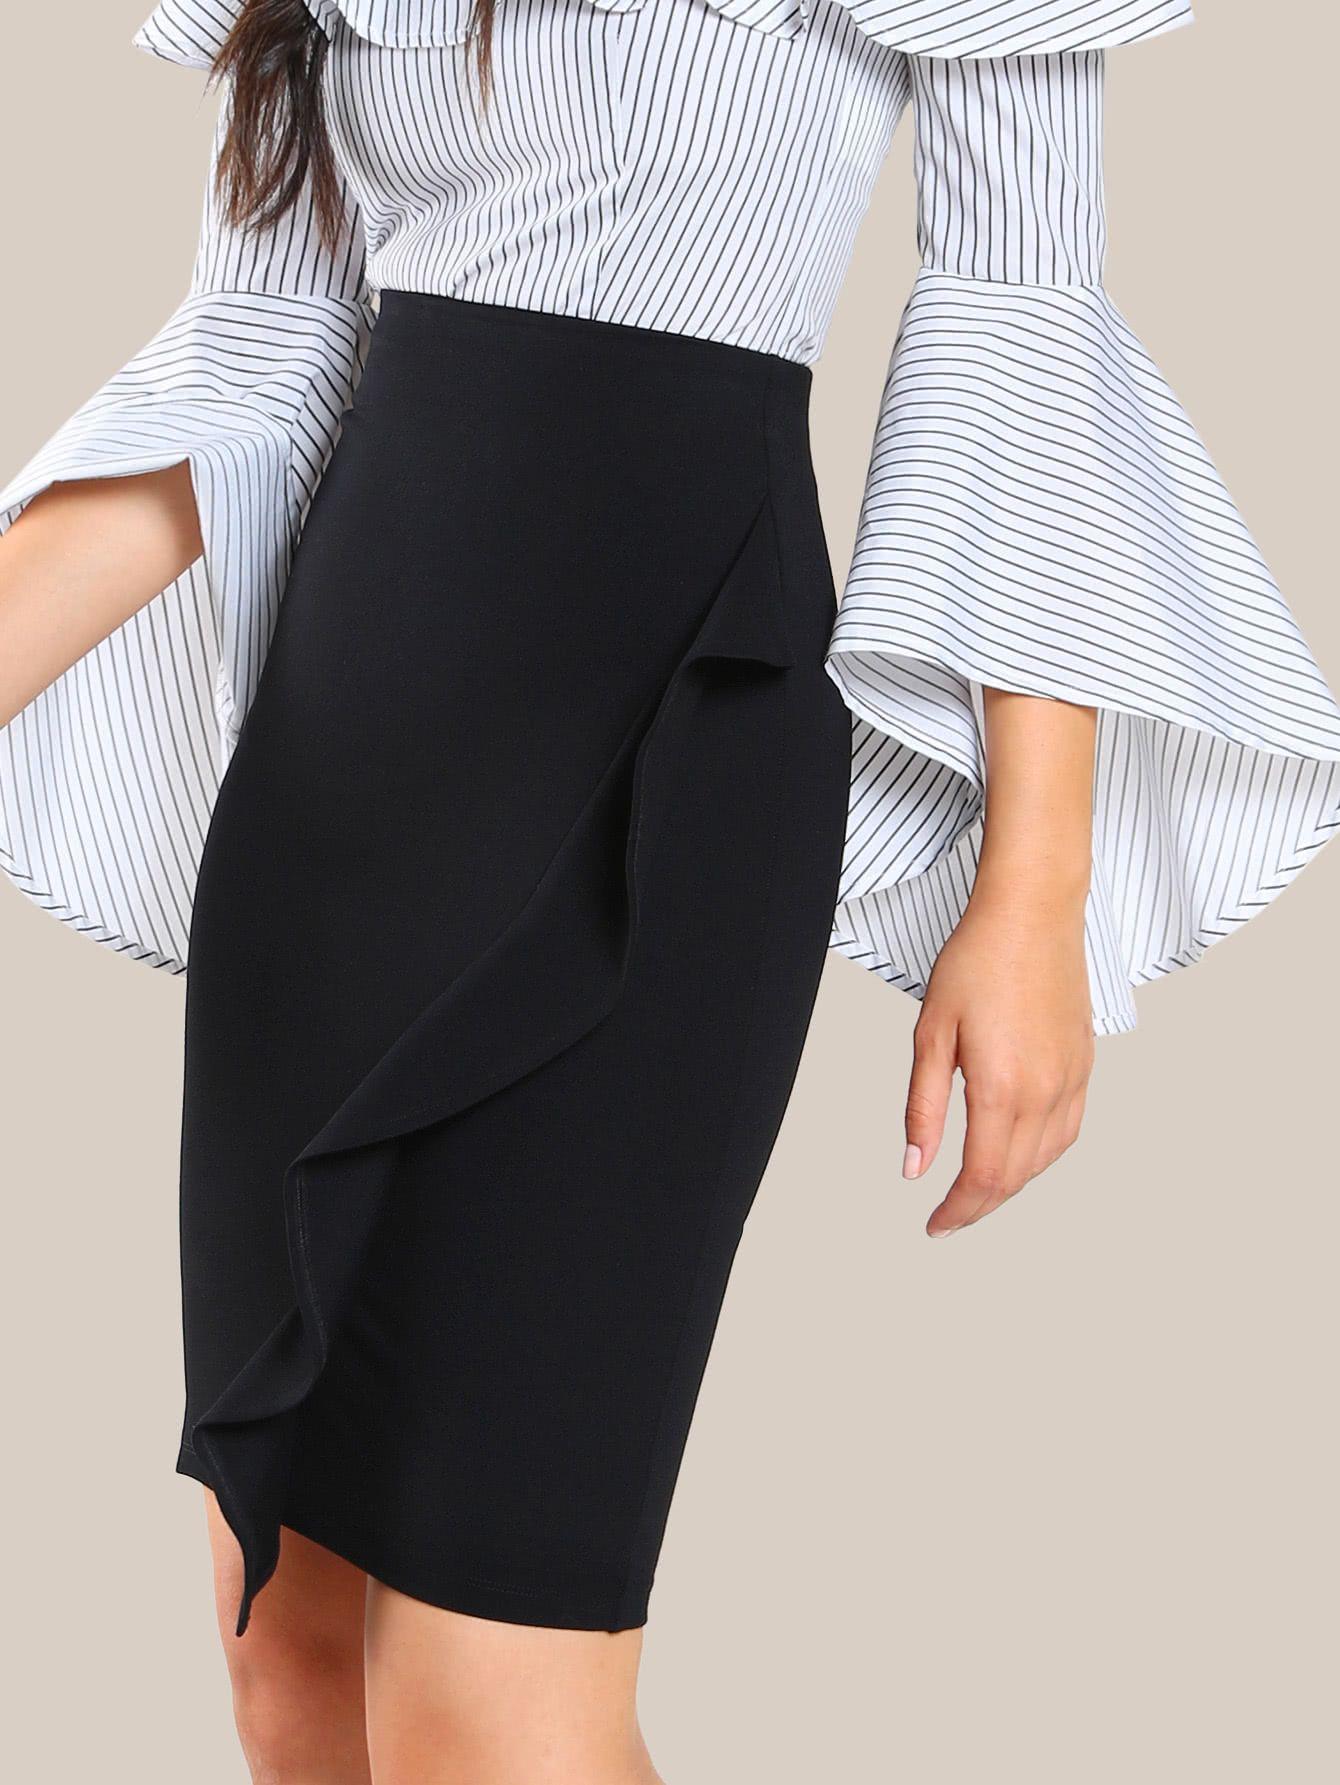 27e5e66e0b Office Skirts Online – DACC